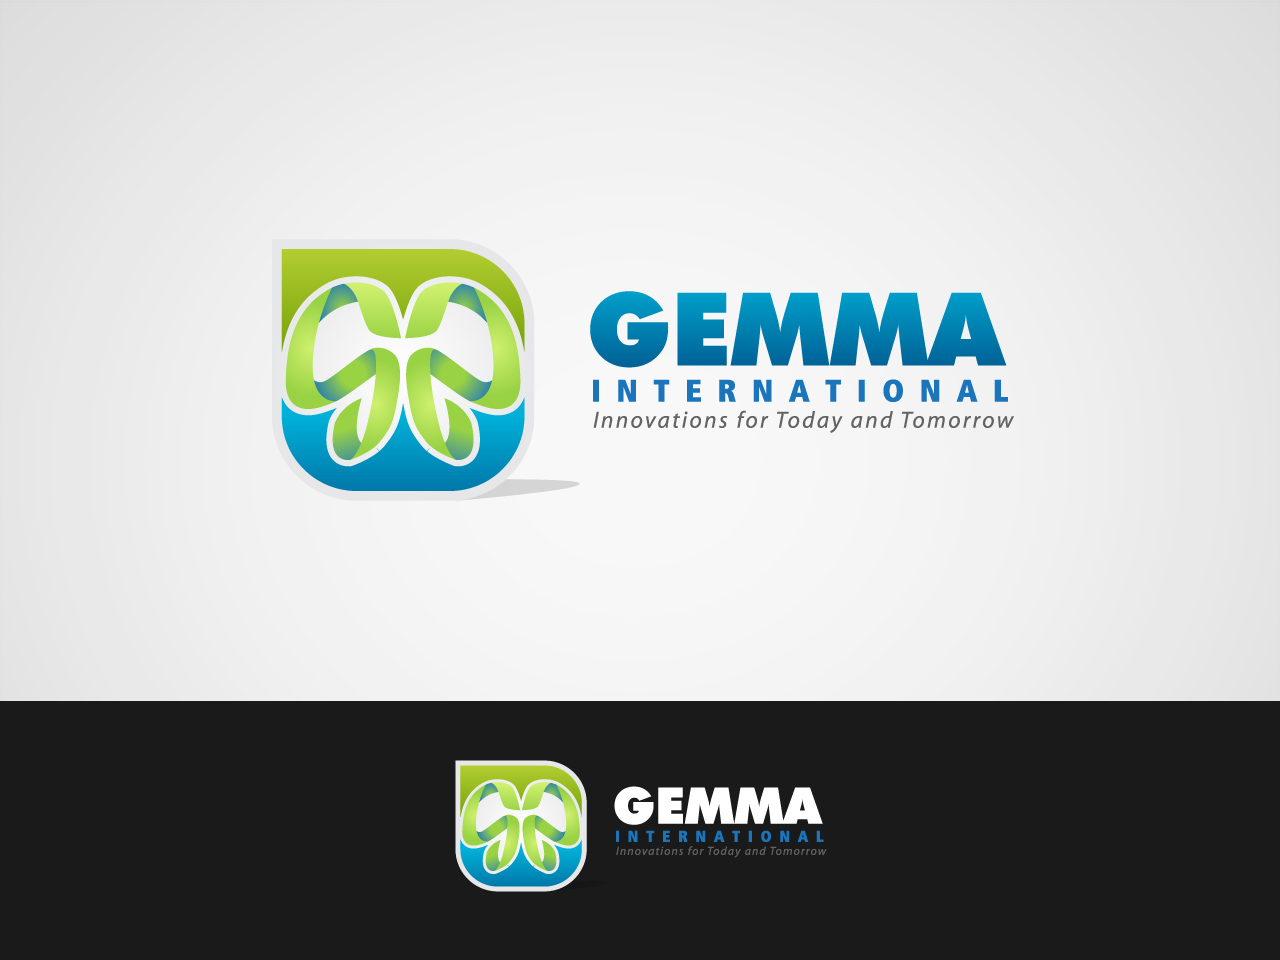 Logo Design by jpbituin - Entry No. 41 in the Logo Design Contest Artistic Logo Design for Gemma International.